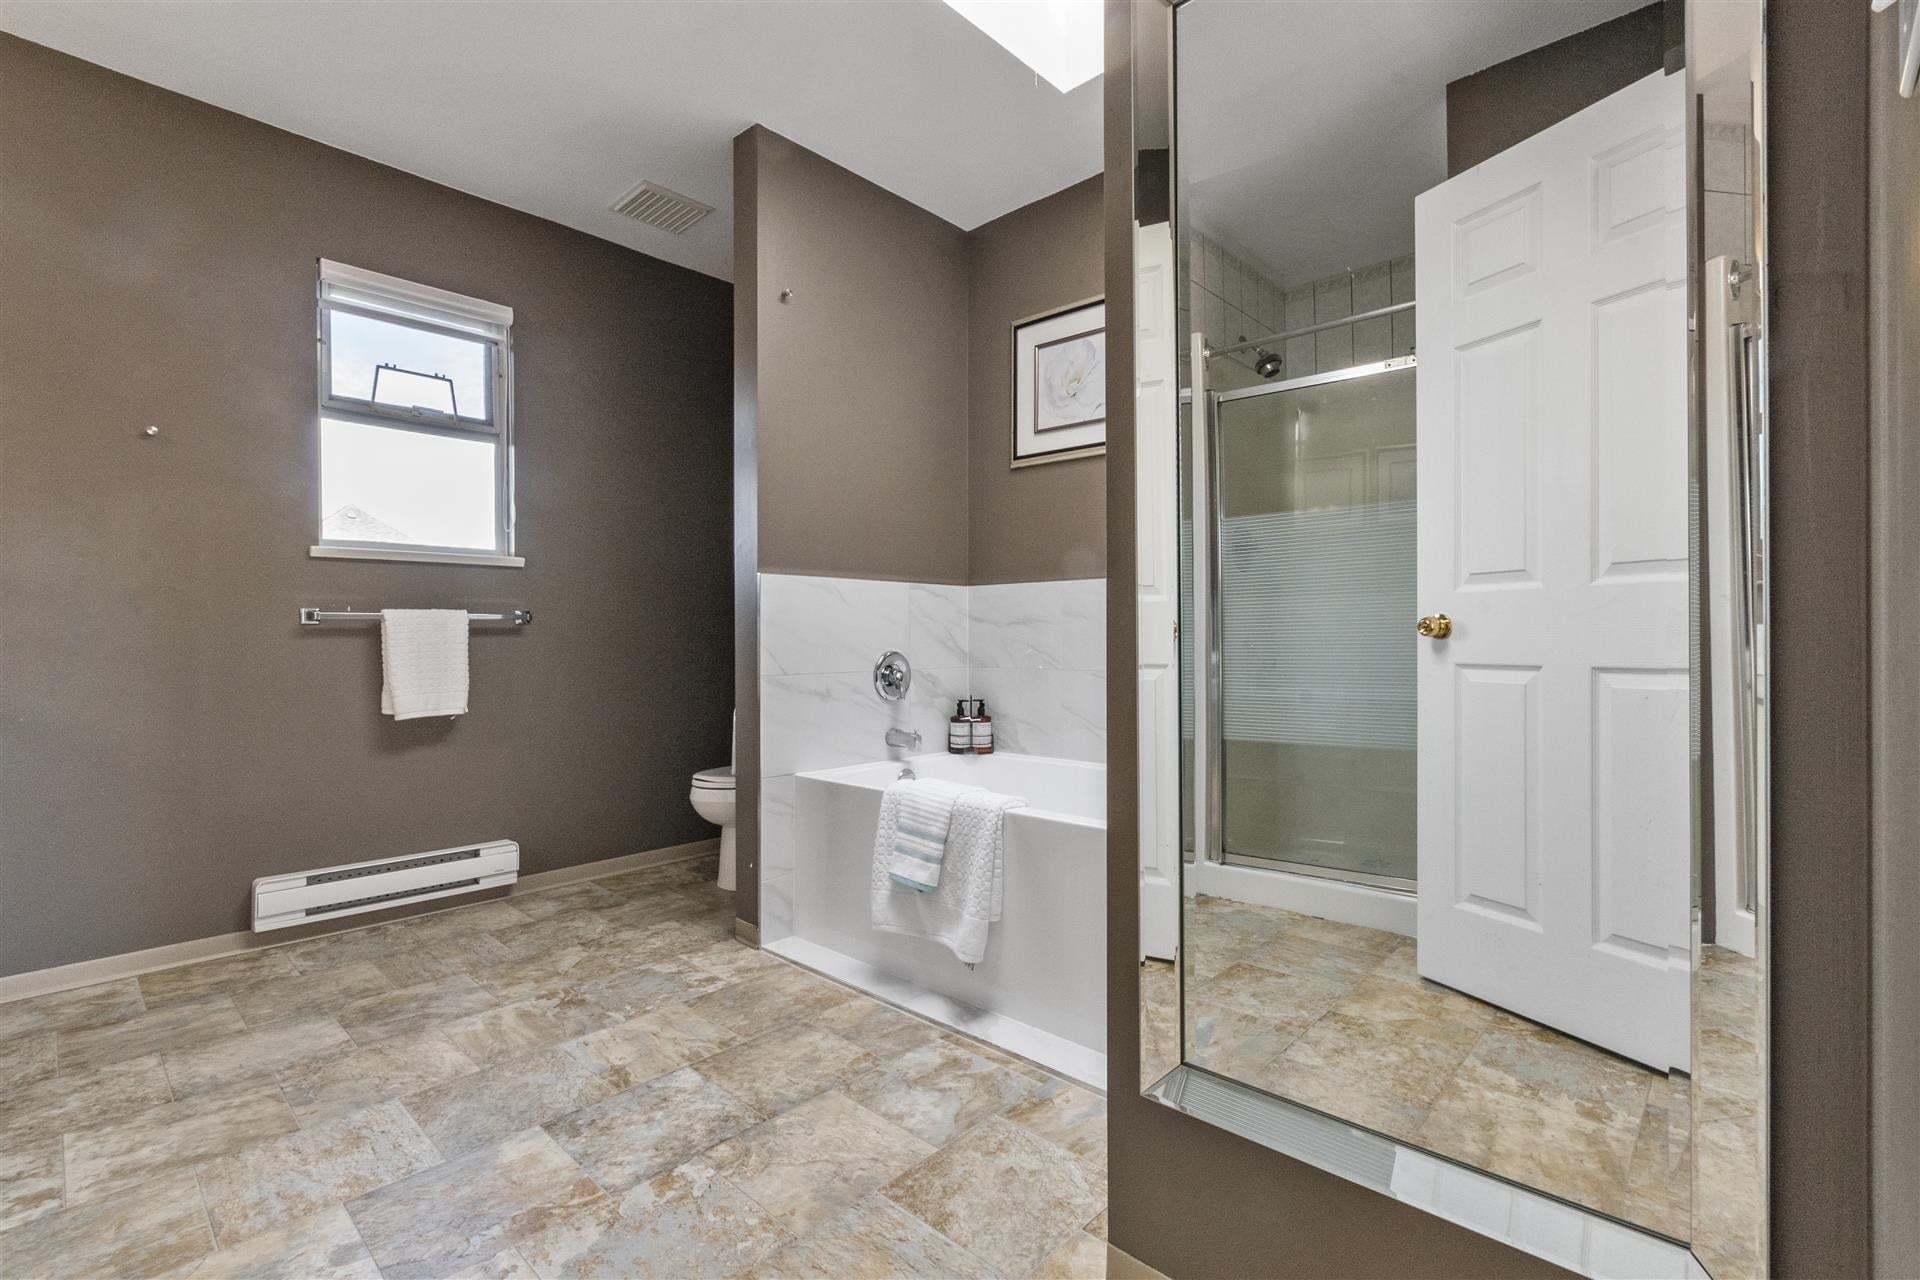 3631 GEORGIA STREET - Steveston Village House/Single Family for sale, 3 Bedrooms (R2623894) - #12